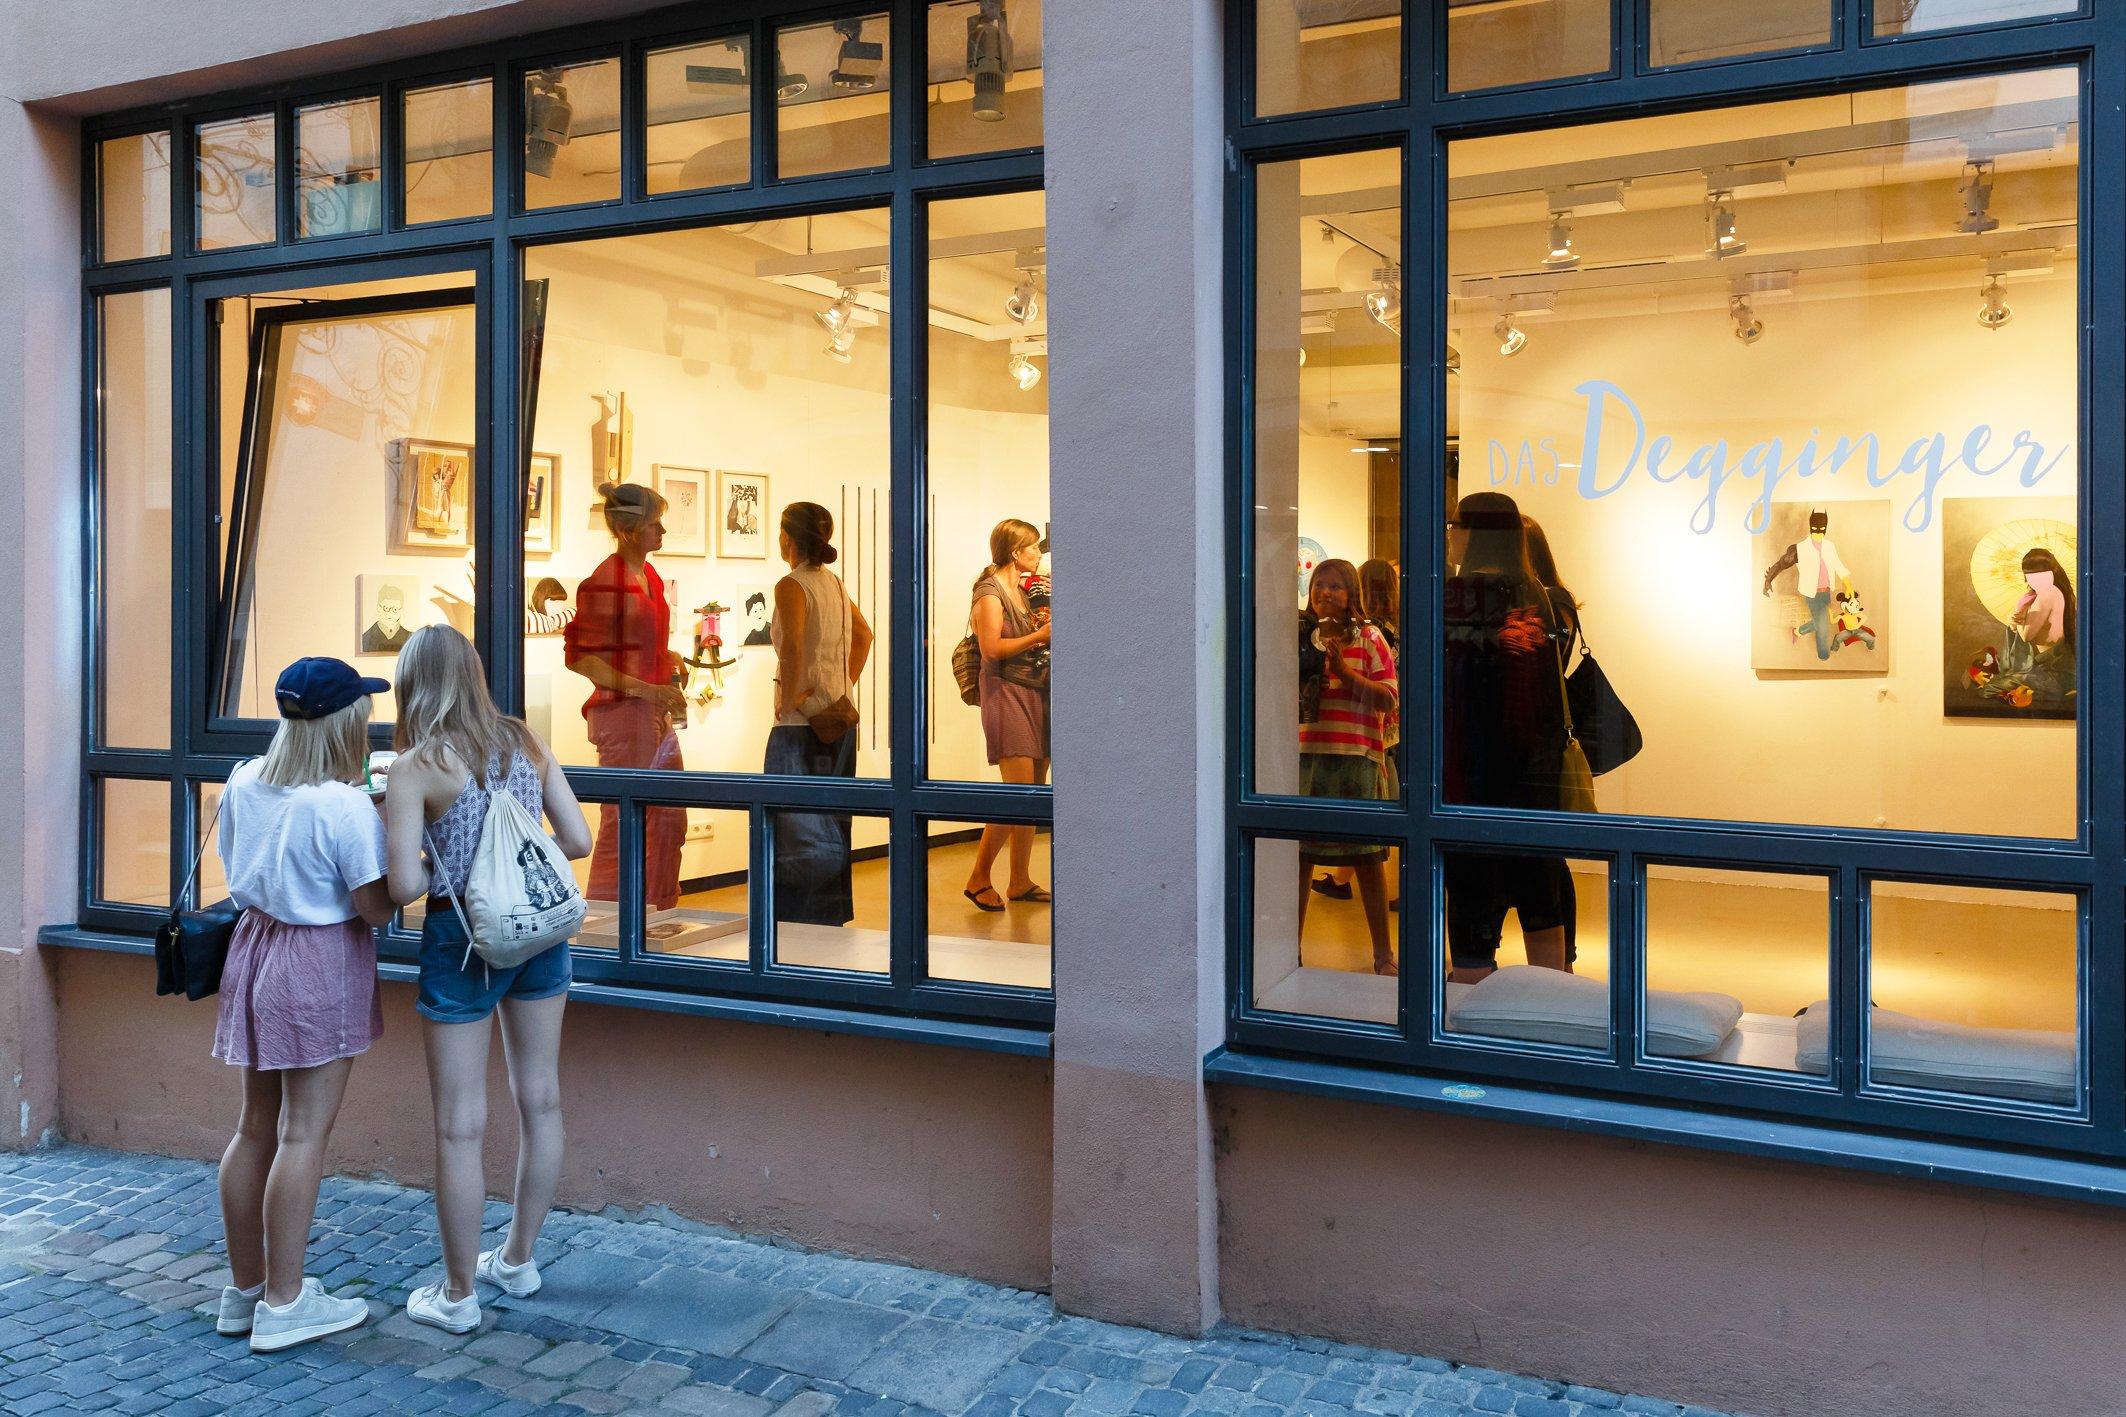 POPUP Galerie Regensburger Regensburger Galerienabend Künstler Regensburg